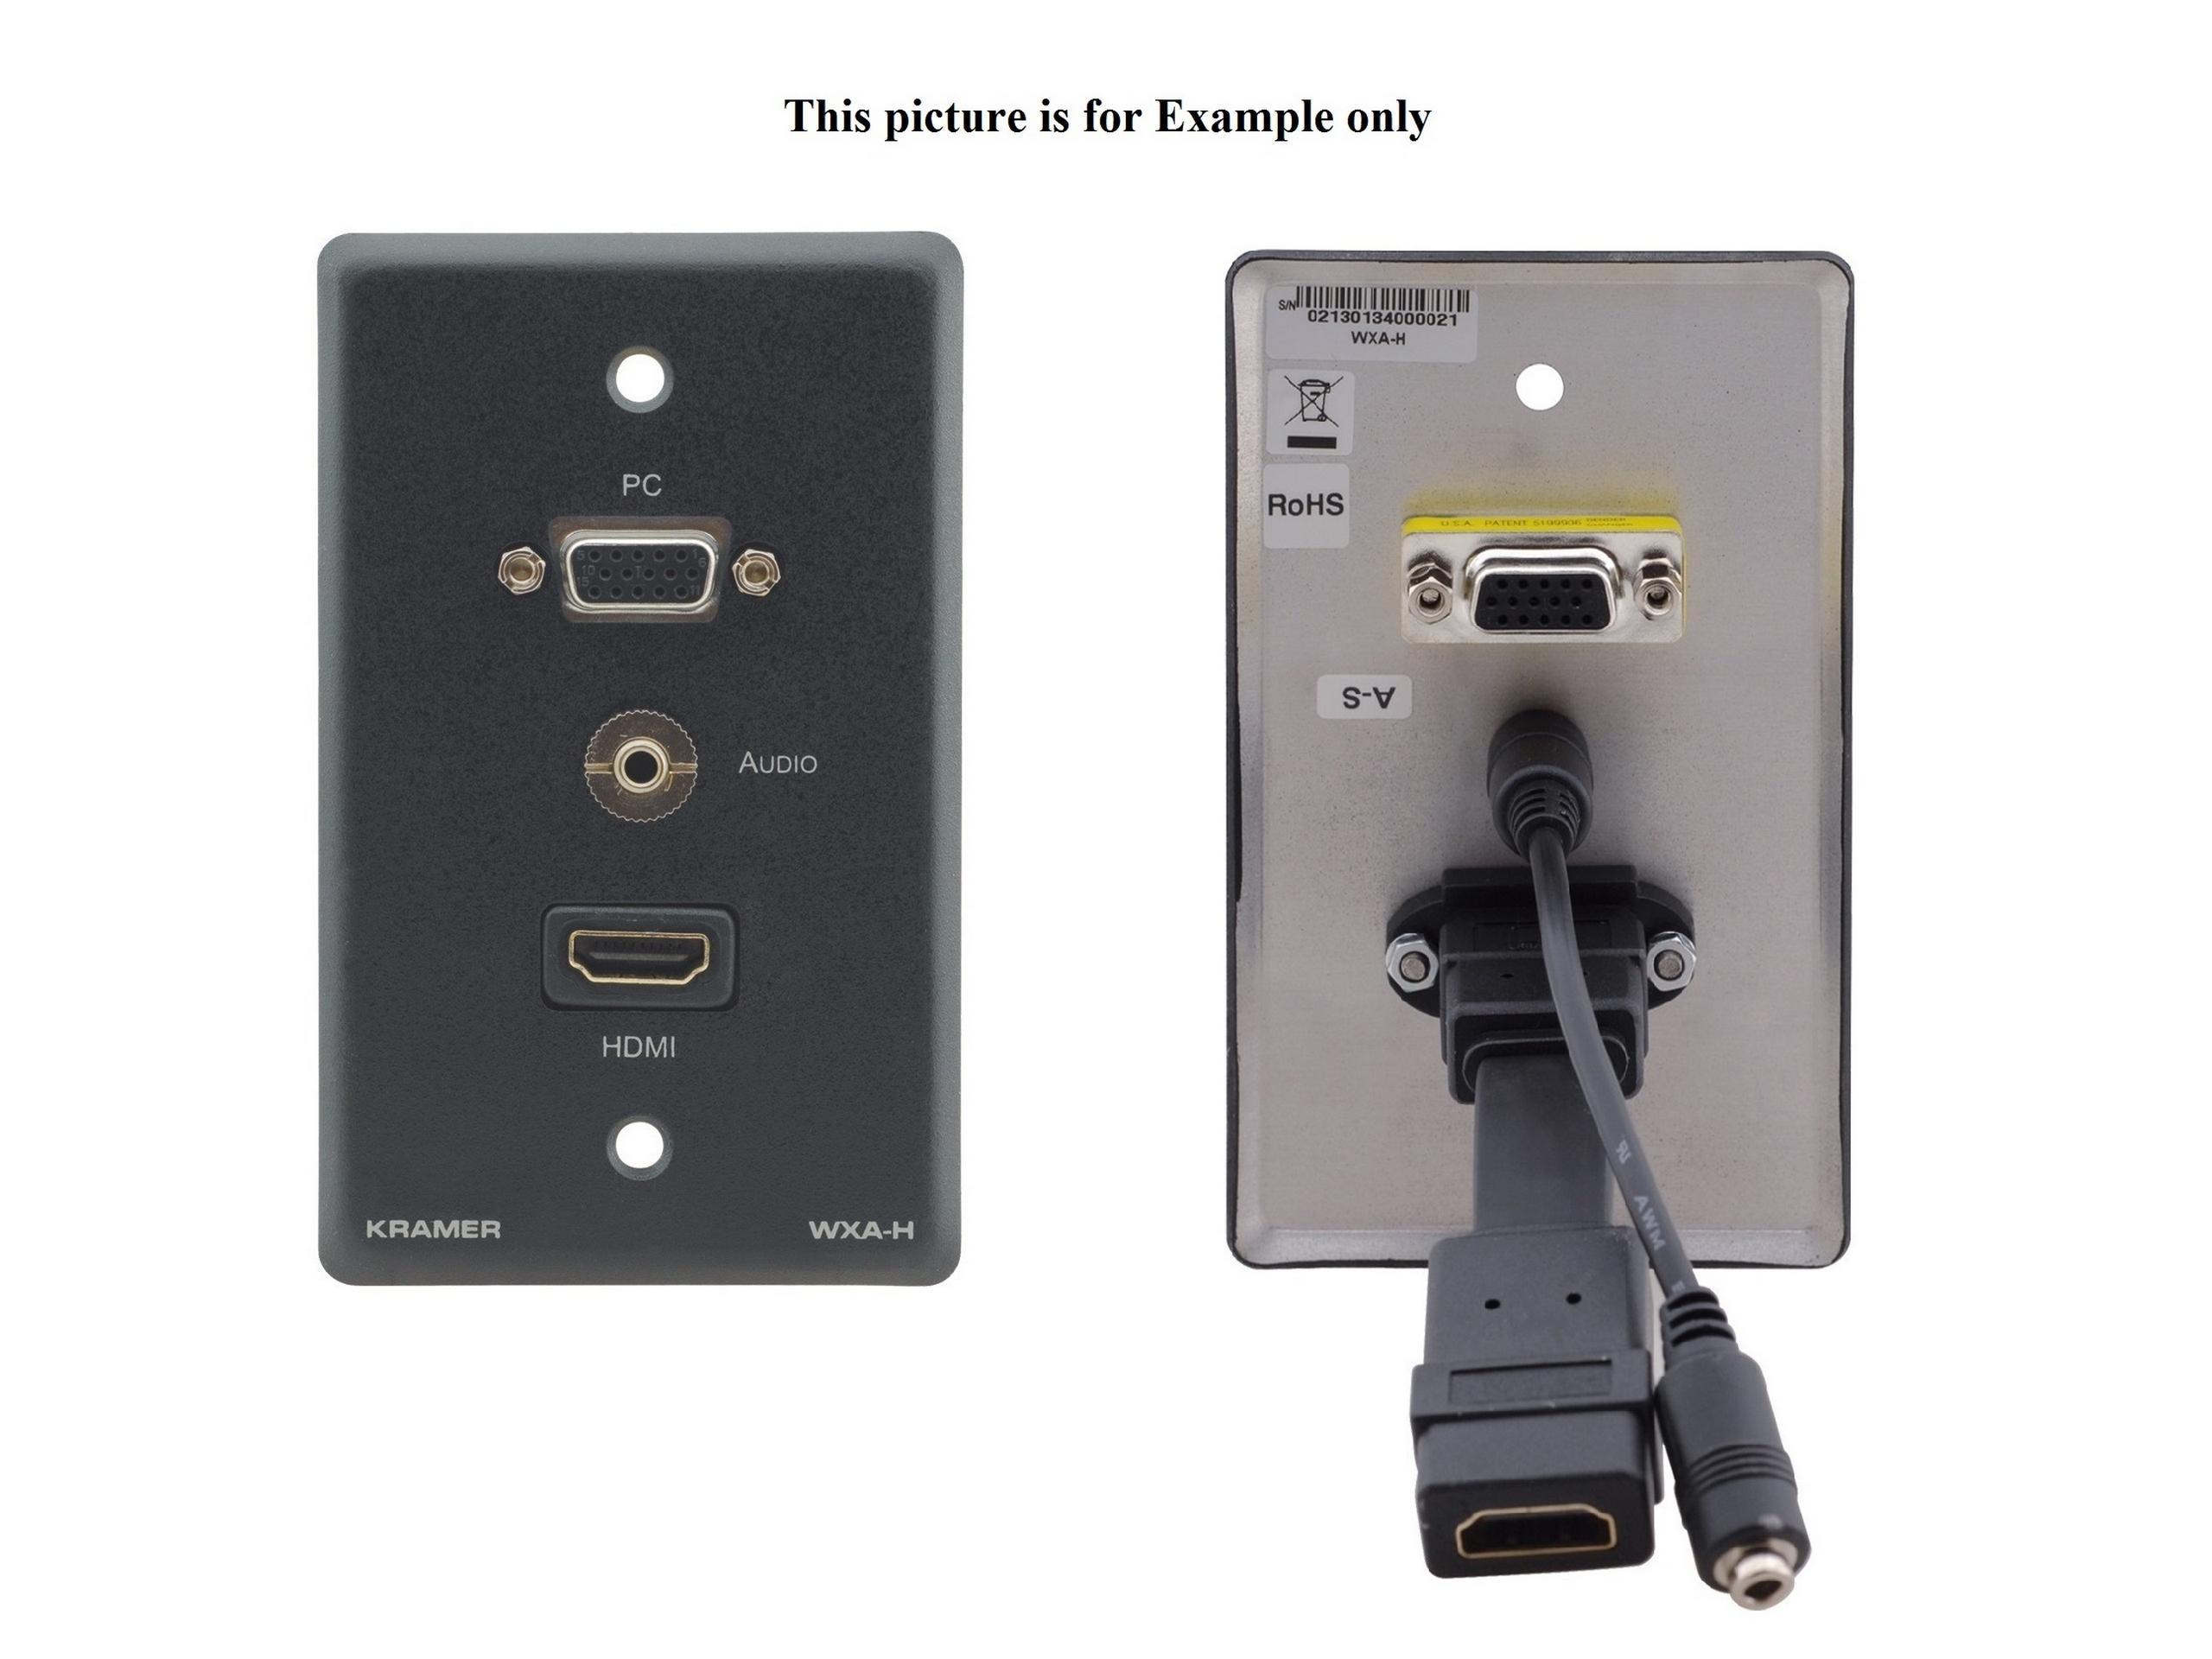 Kramer WXA-H(B) Passive Wall Plate/VGA 15-pin HD/3.5mm Audio and HDMI/Black